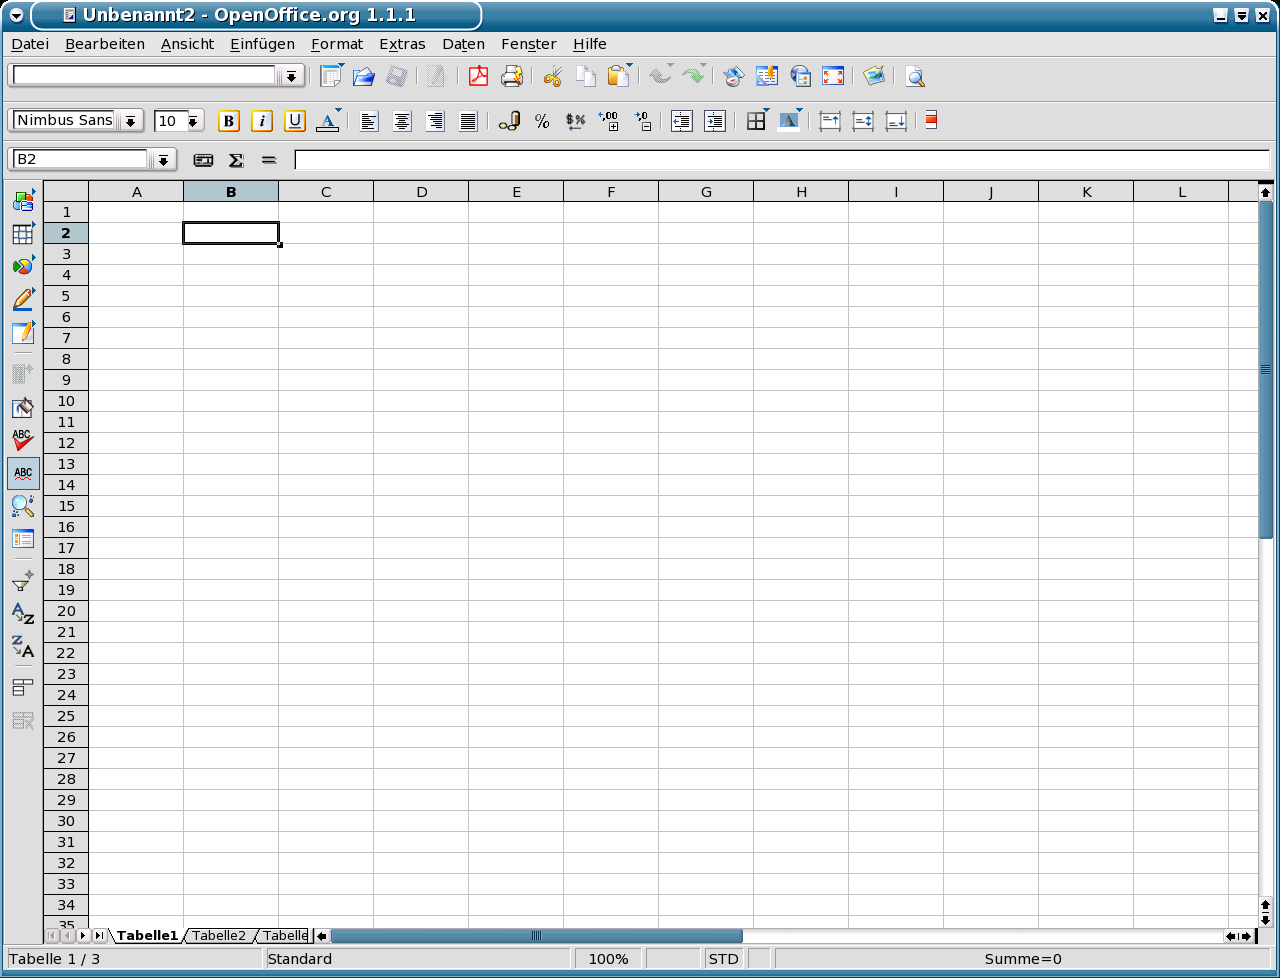 Open Office Spreadsheet Download Regarding Screenshots